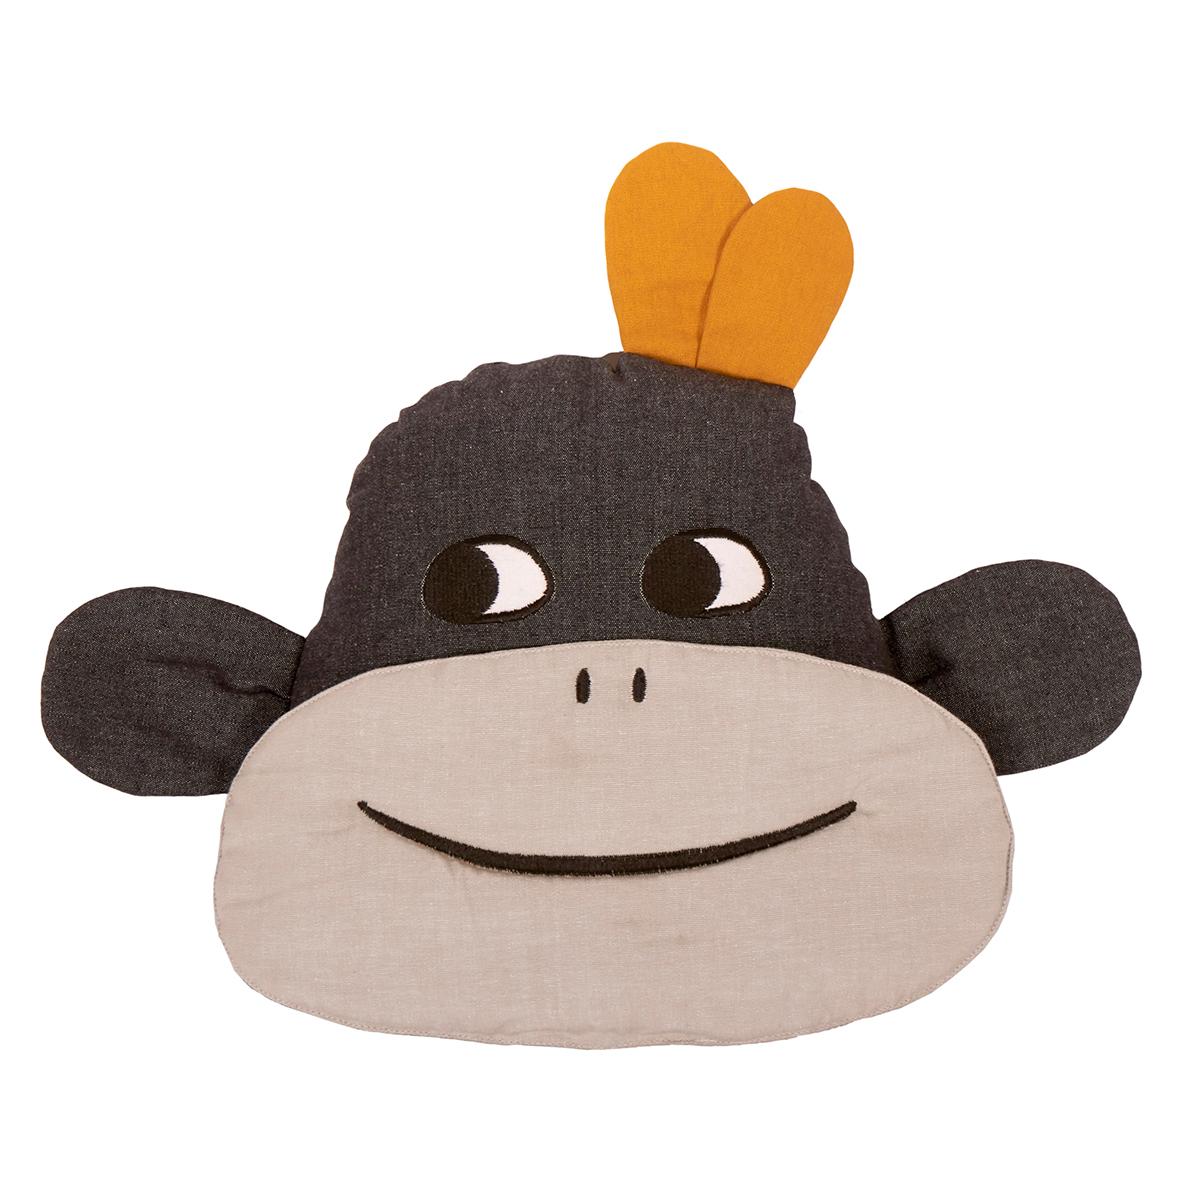 Roommate krammepude - Monkey